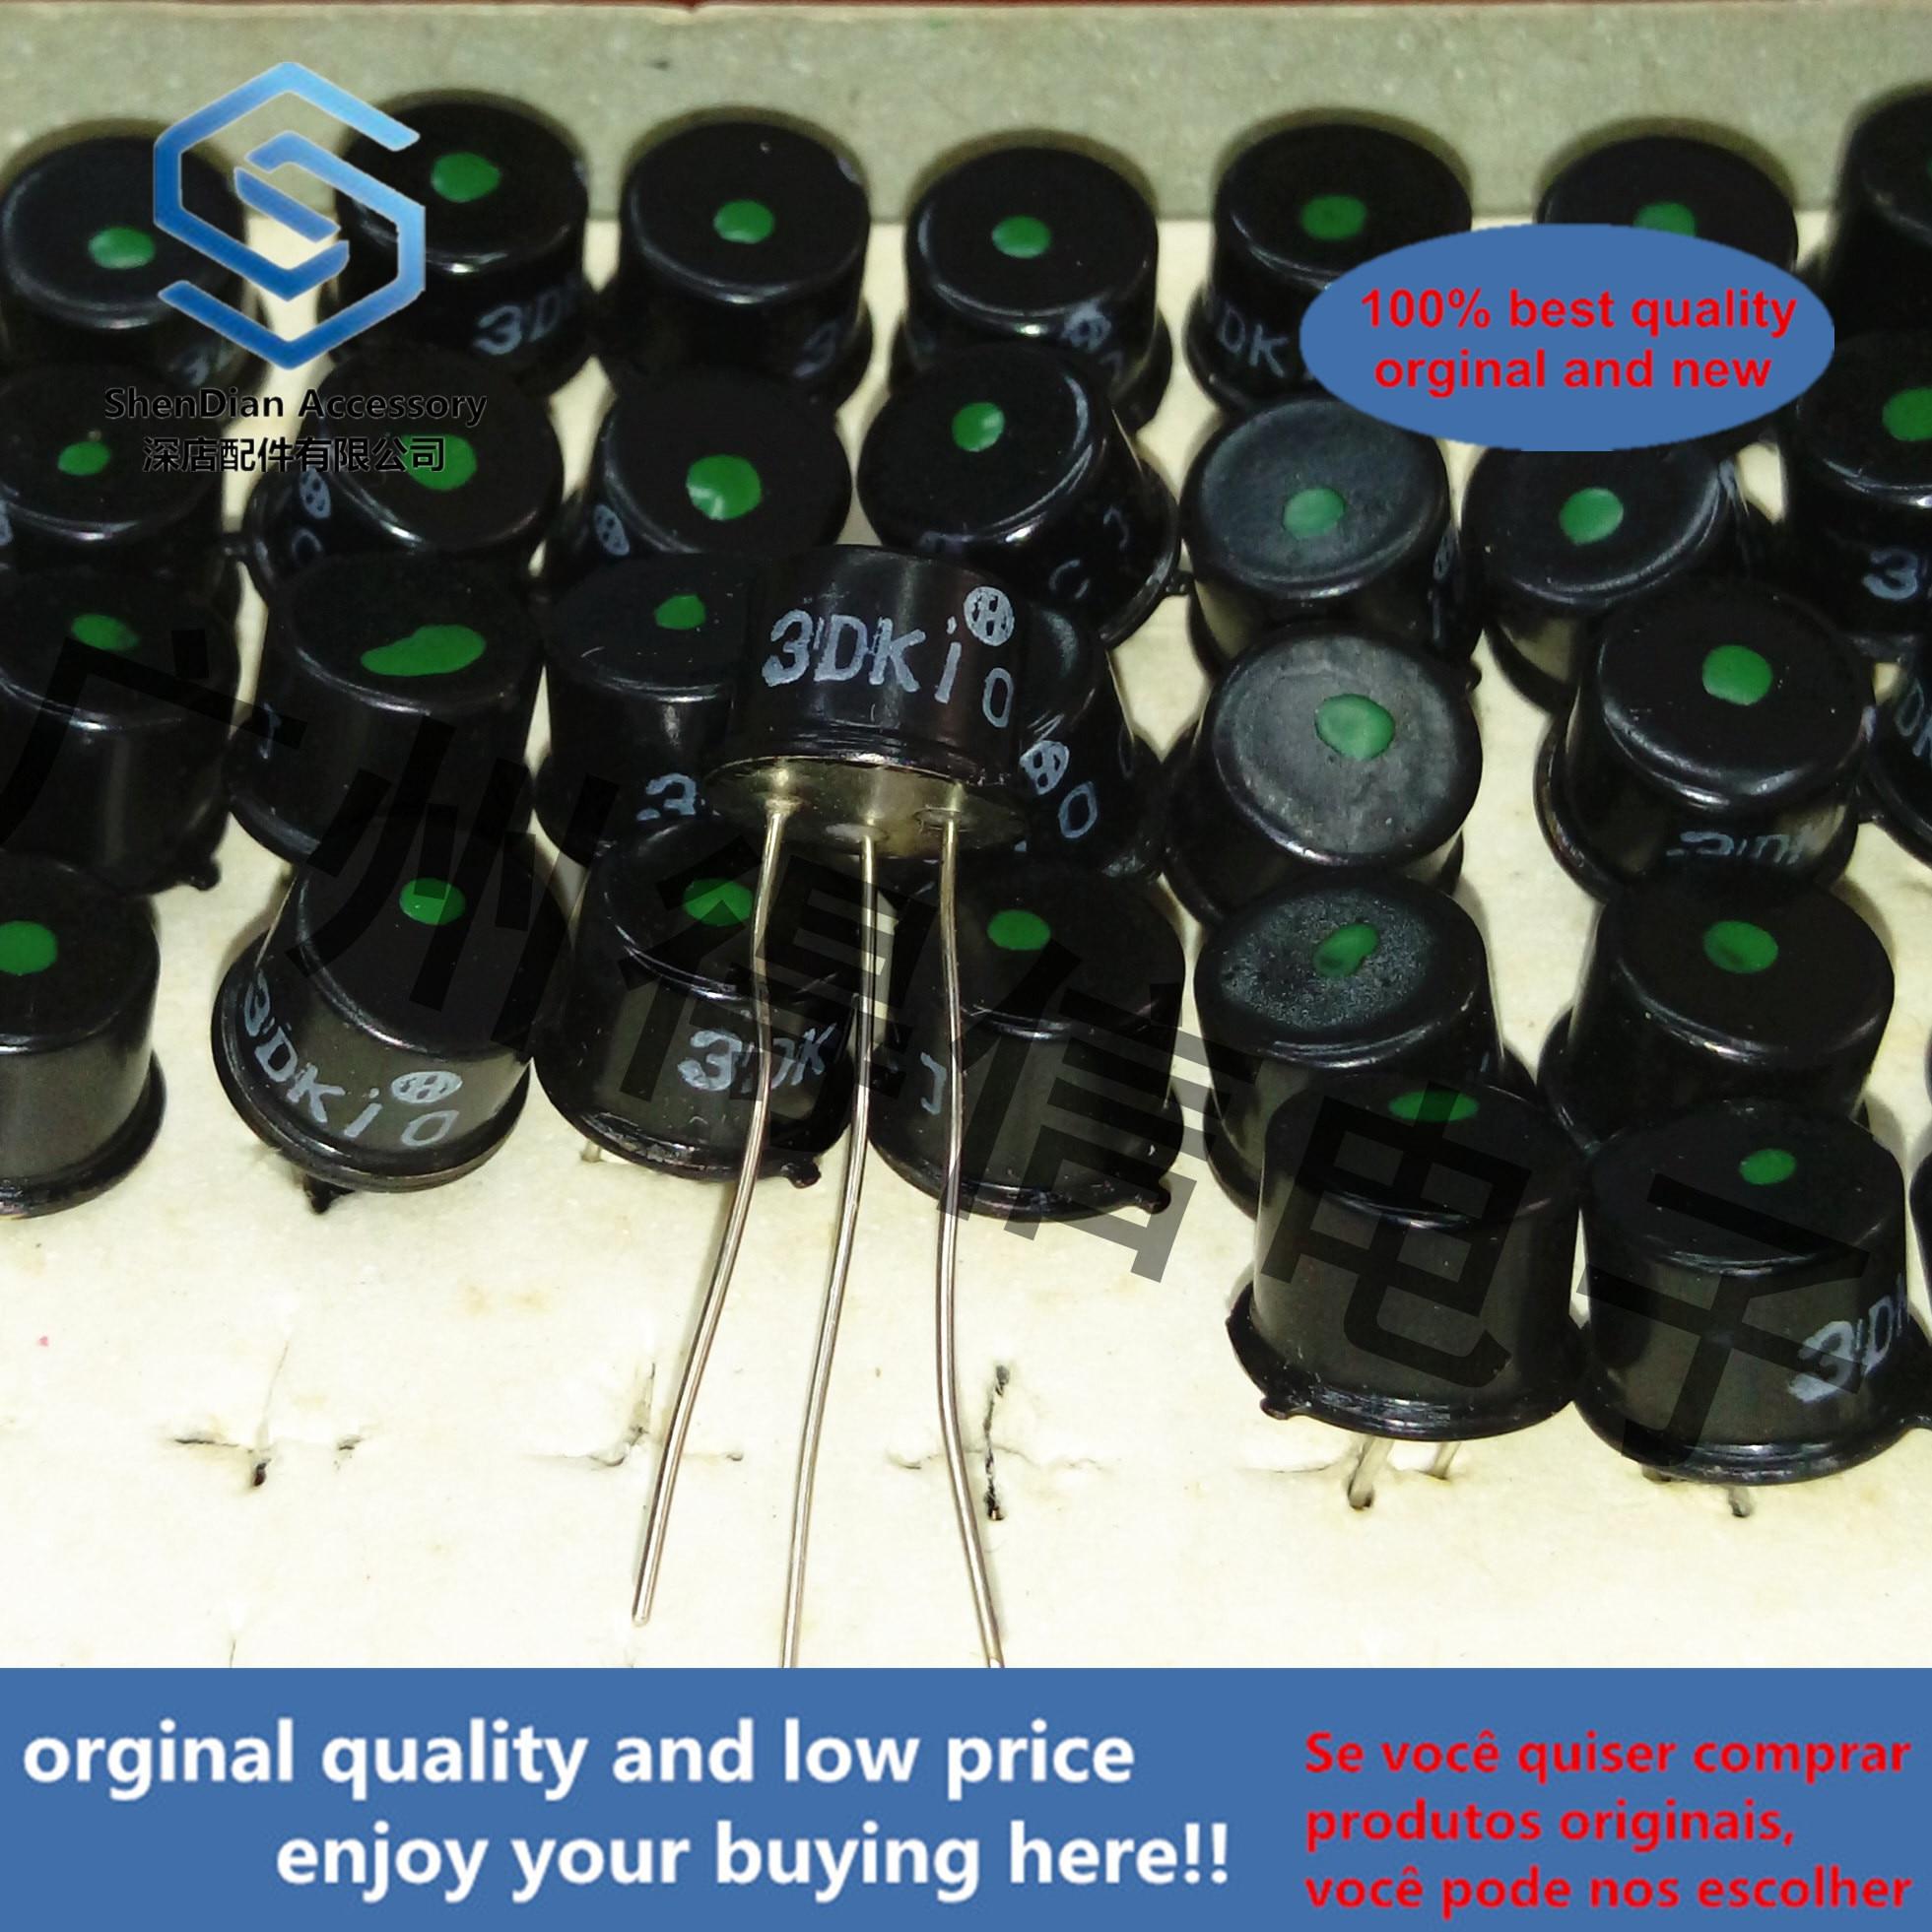 5pcs 100% Orginal New 3DK10CJ 3DK10C 3DK10 Green Dot Switch Transistor Triode Real Photo